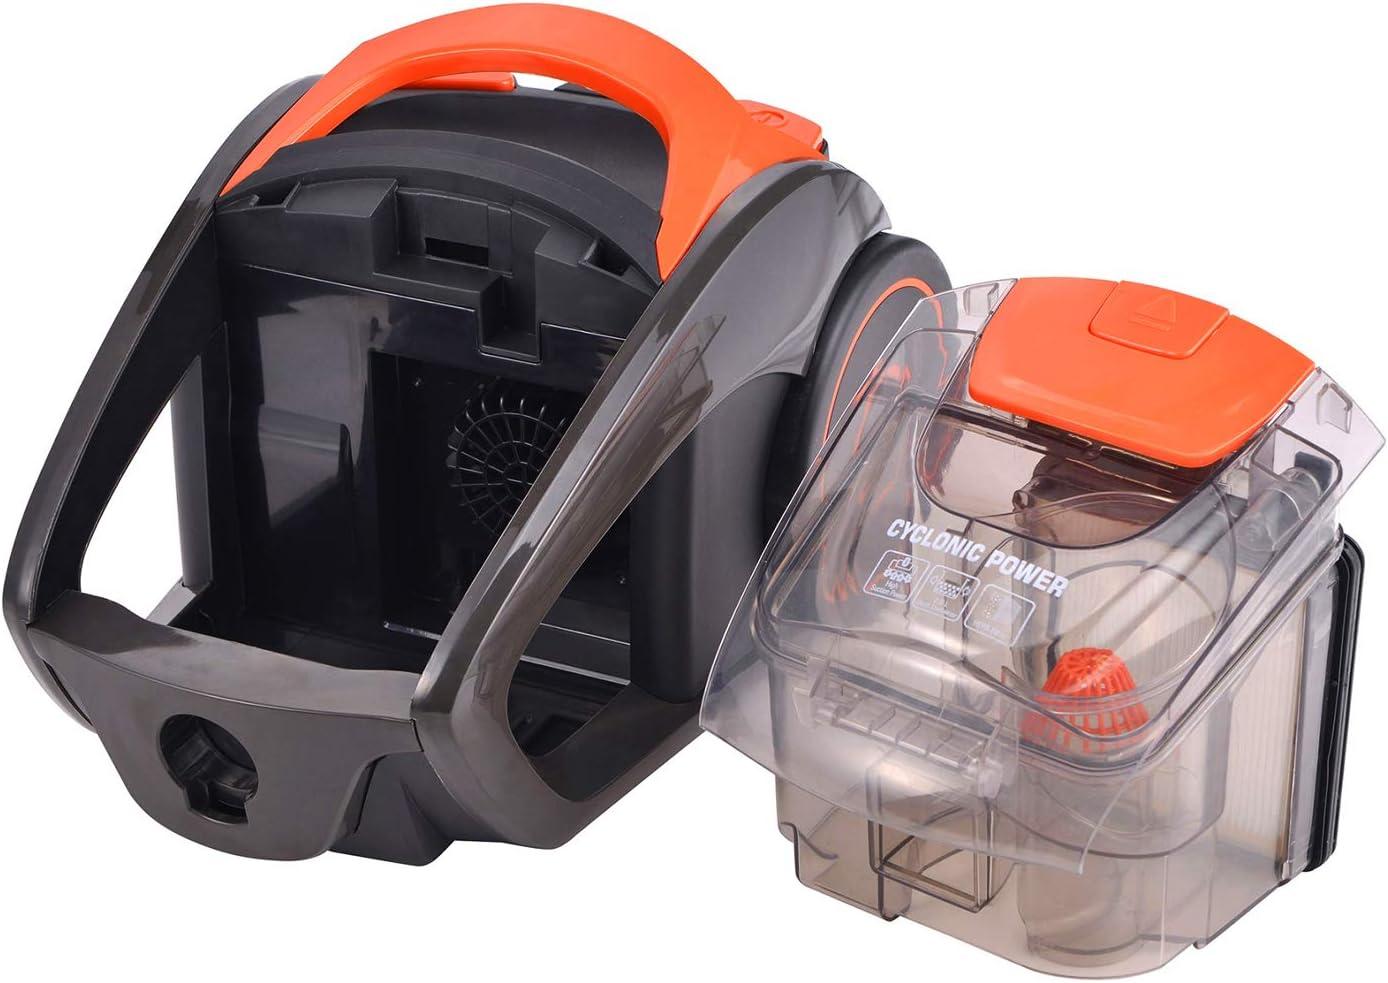 ForMe Aspirador sin Bolsa Sistema Cicl/ónico Compacto I 2 L Dep/ósito I Multicicl/ónico 700W I Filtro de 5 Etapas I Cepillo parquet y boquilla 2 en 1 para ranuras 79 dB